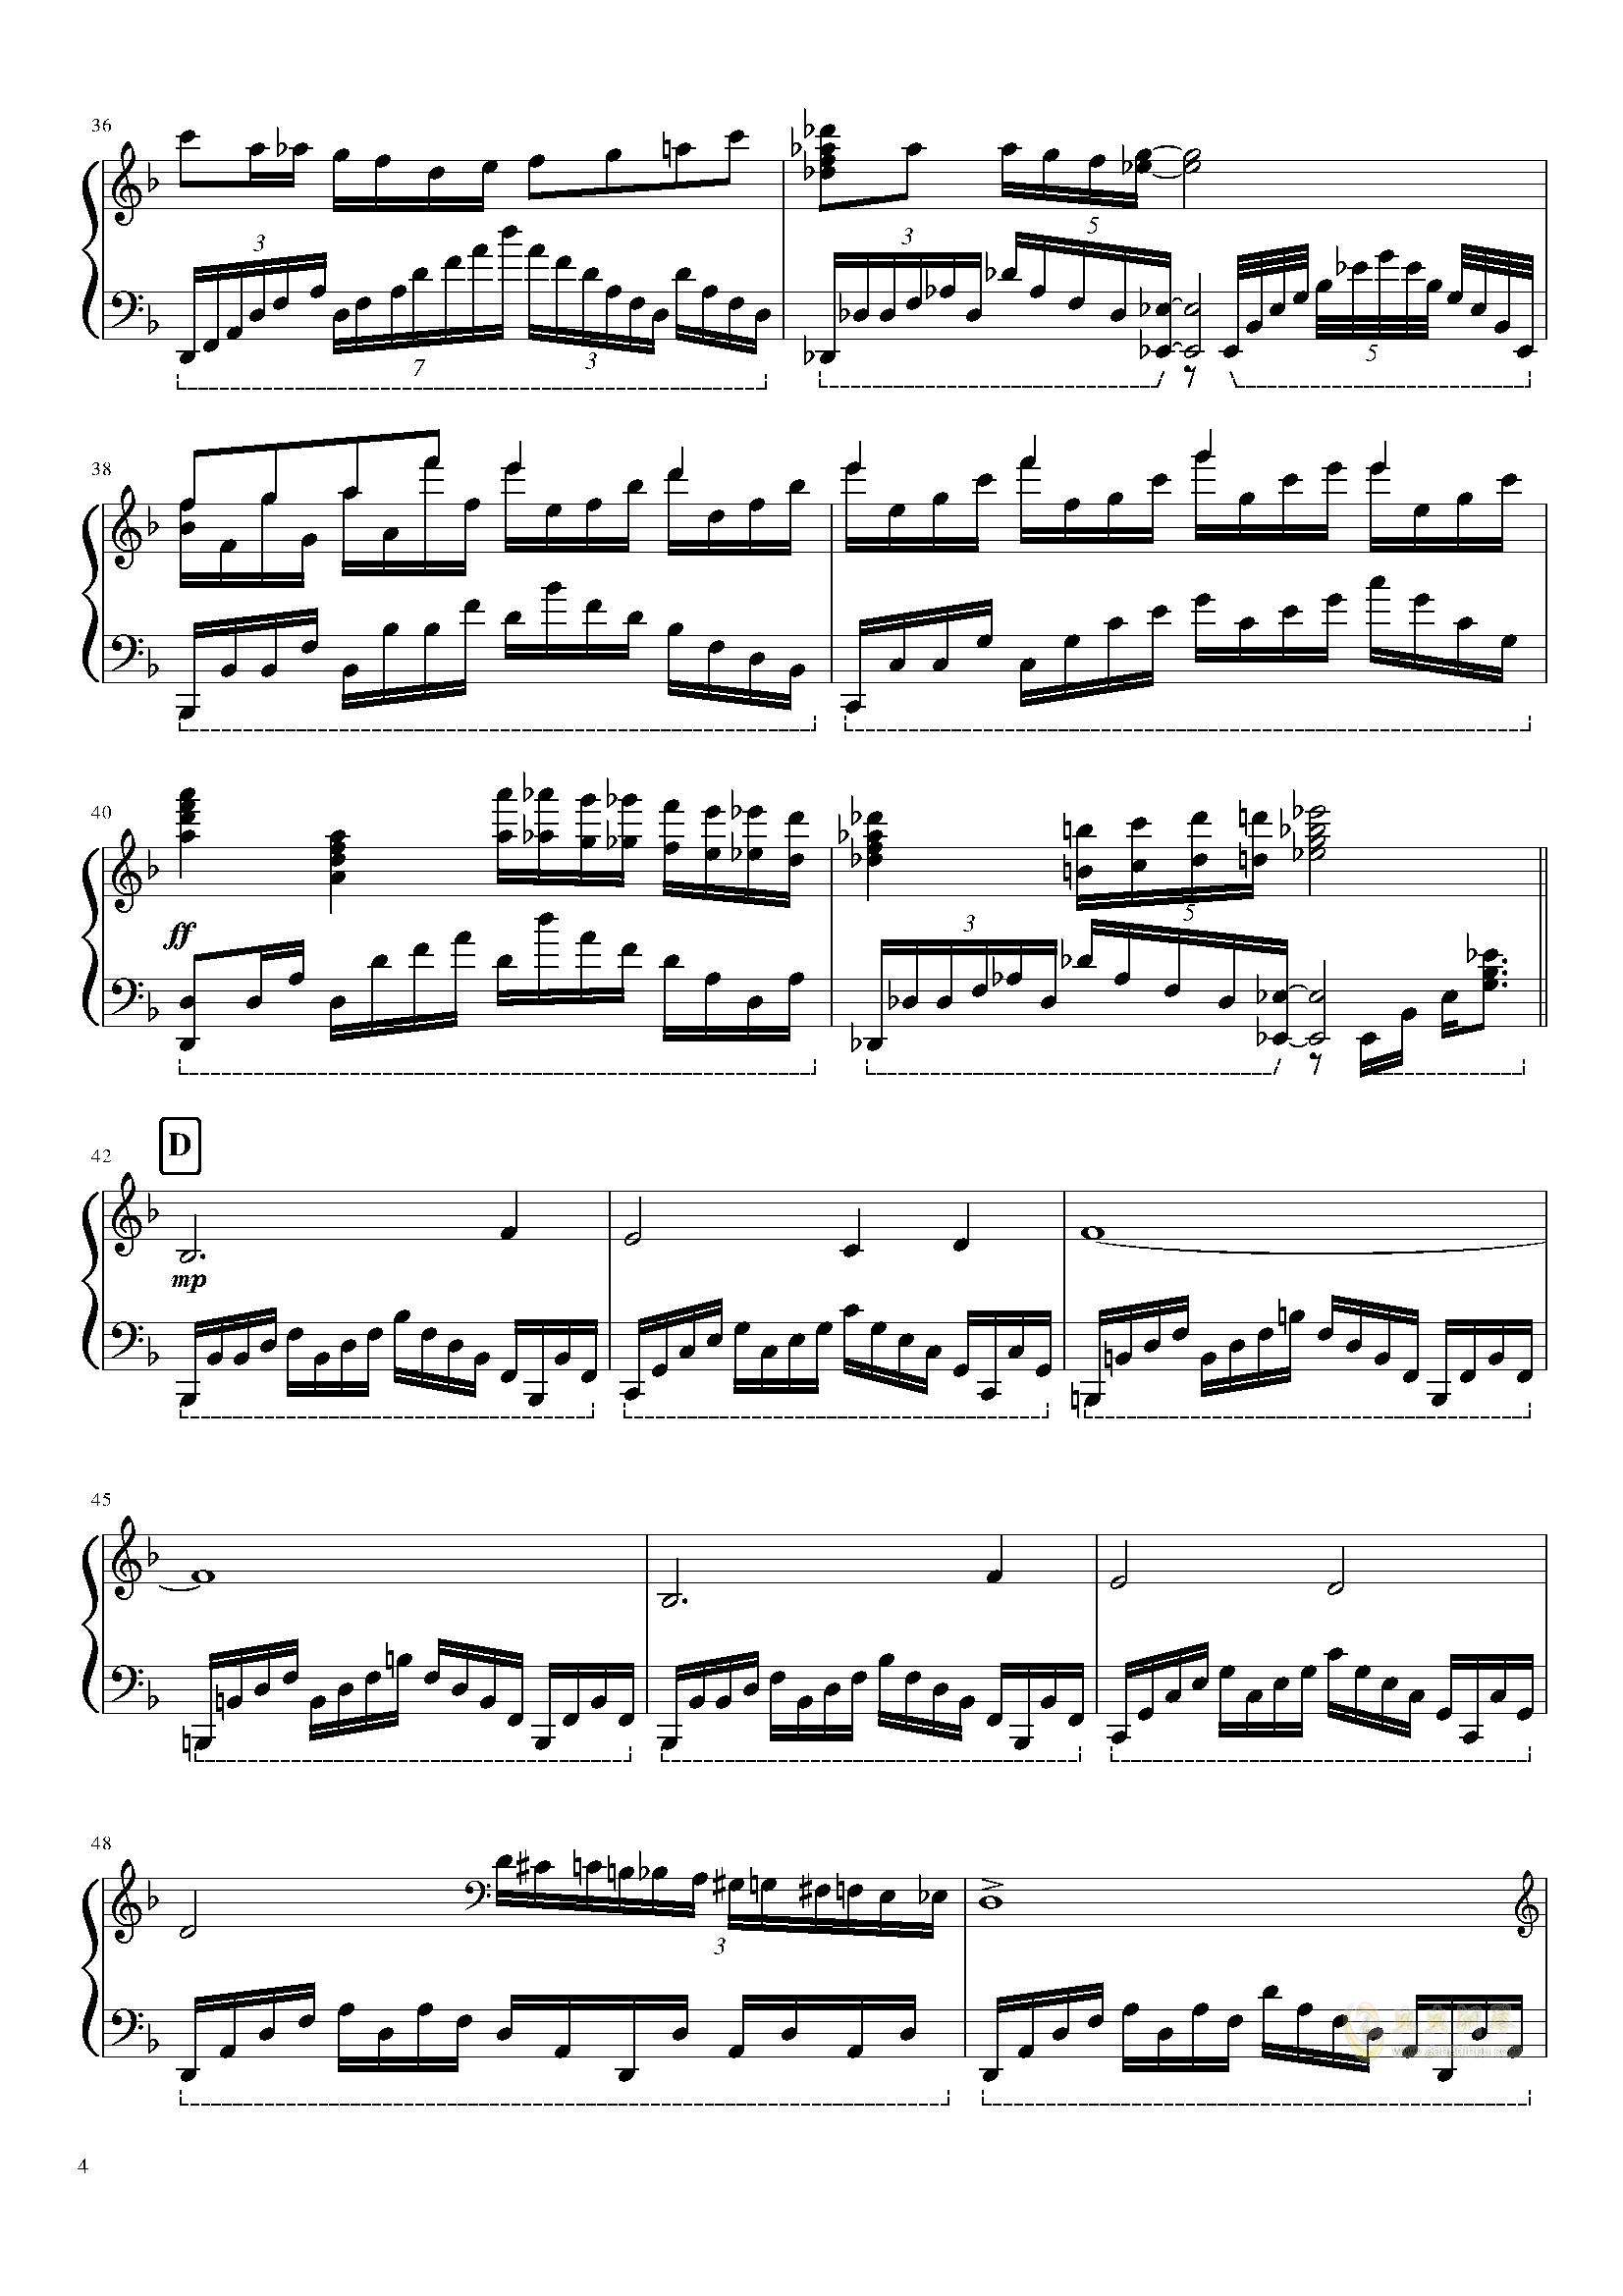 Megalovania钢琴谱 第4页